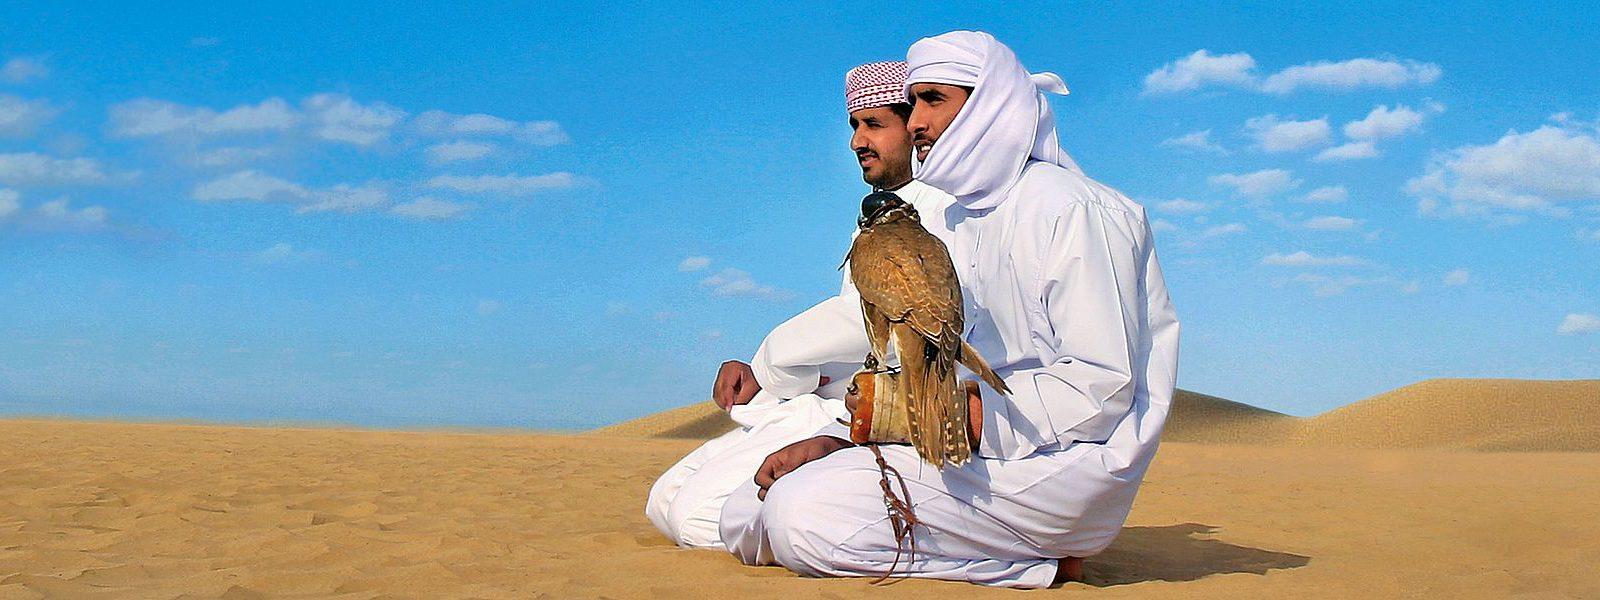 Stopover-Tipps für Dubai